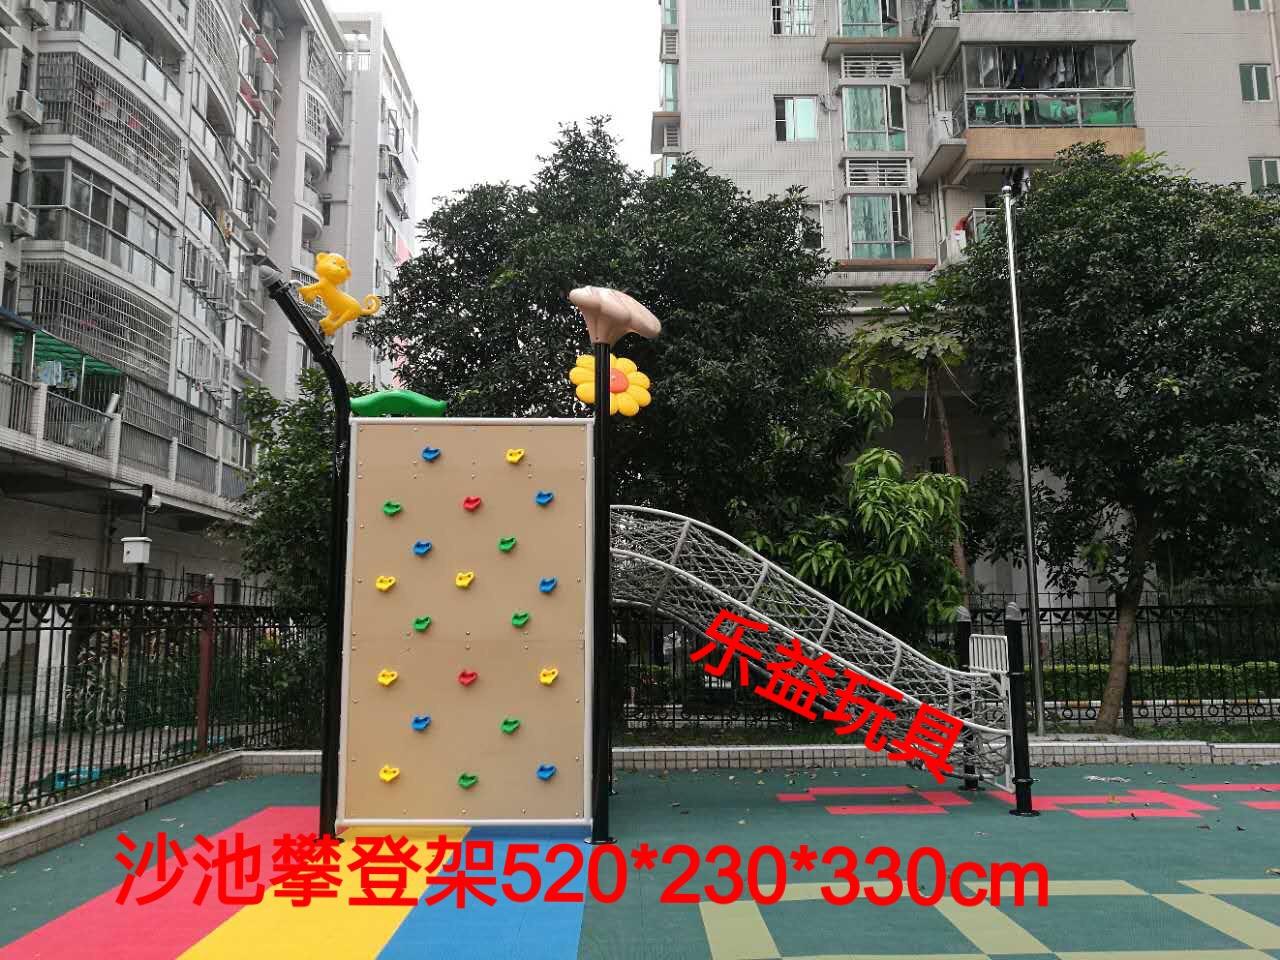 LY1713303 组合攀爬架